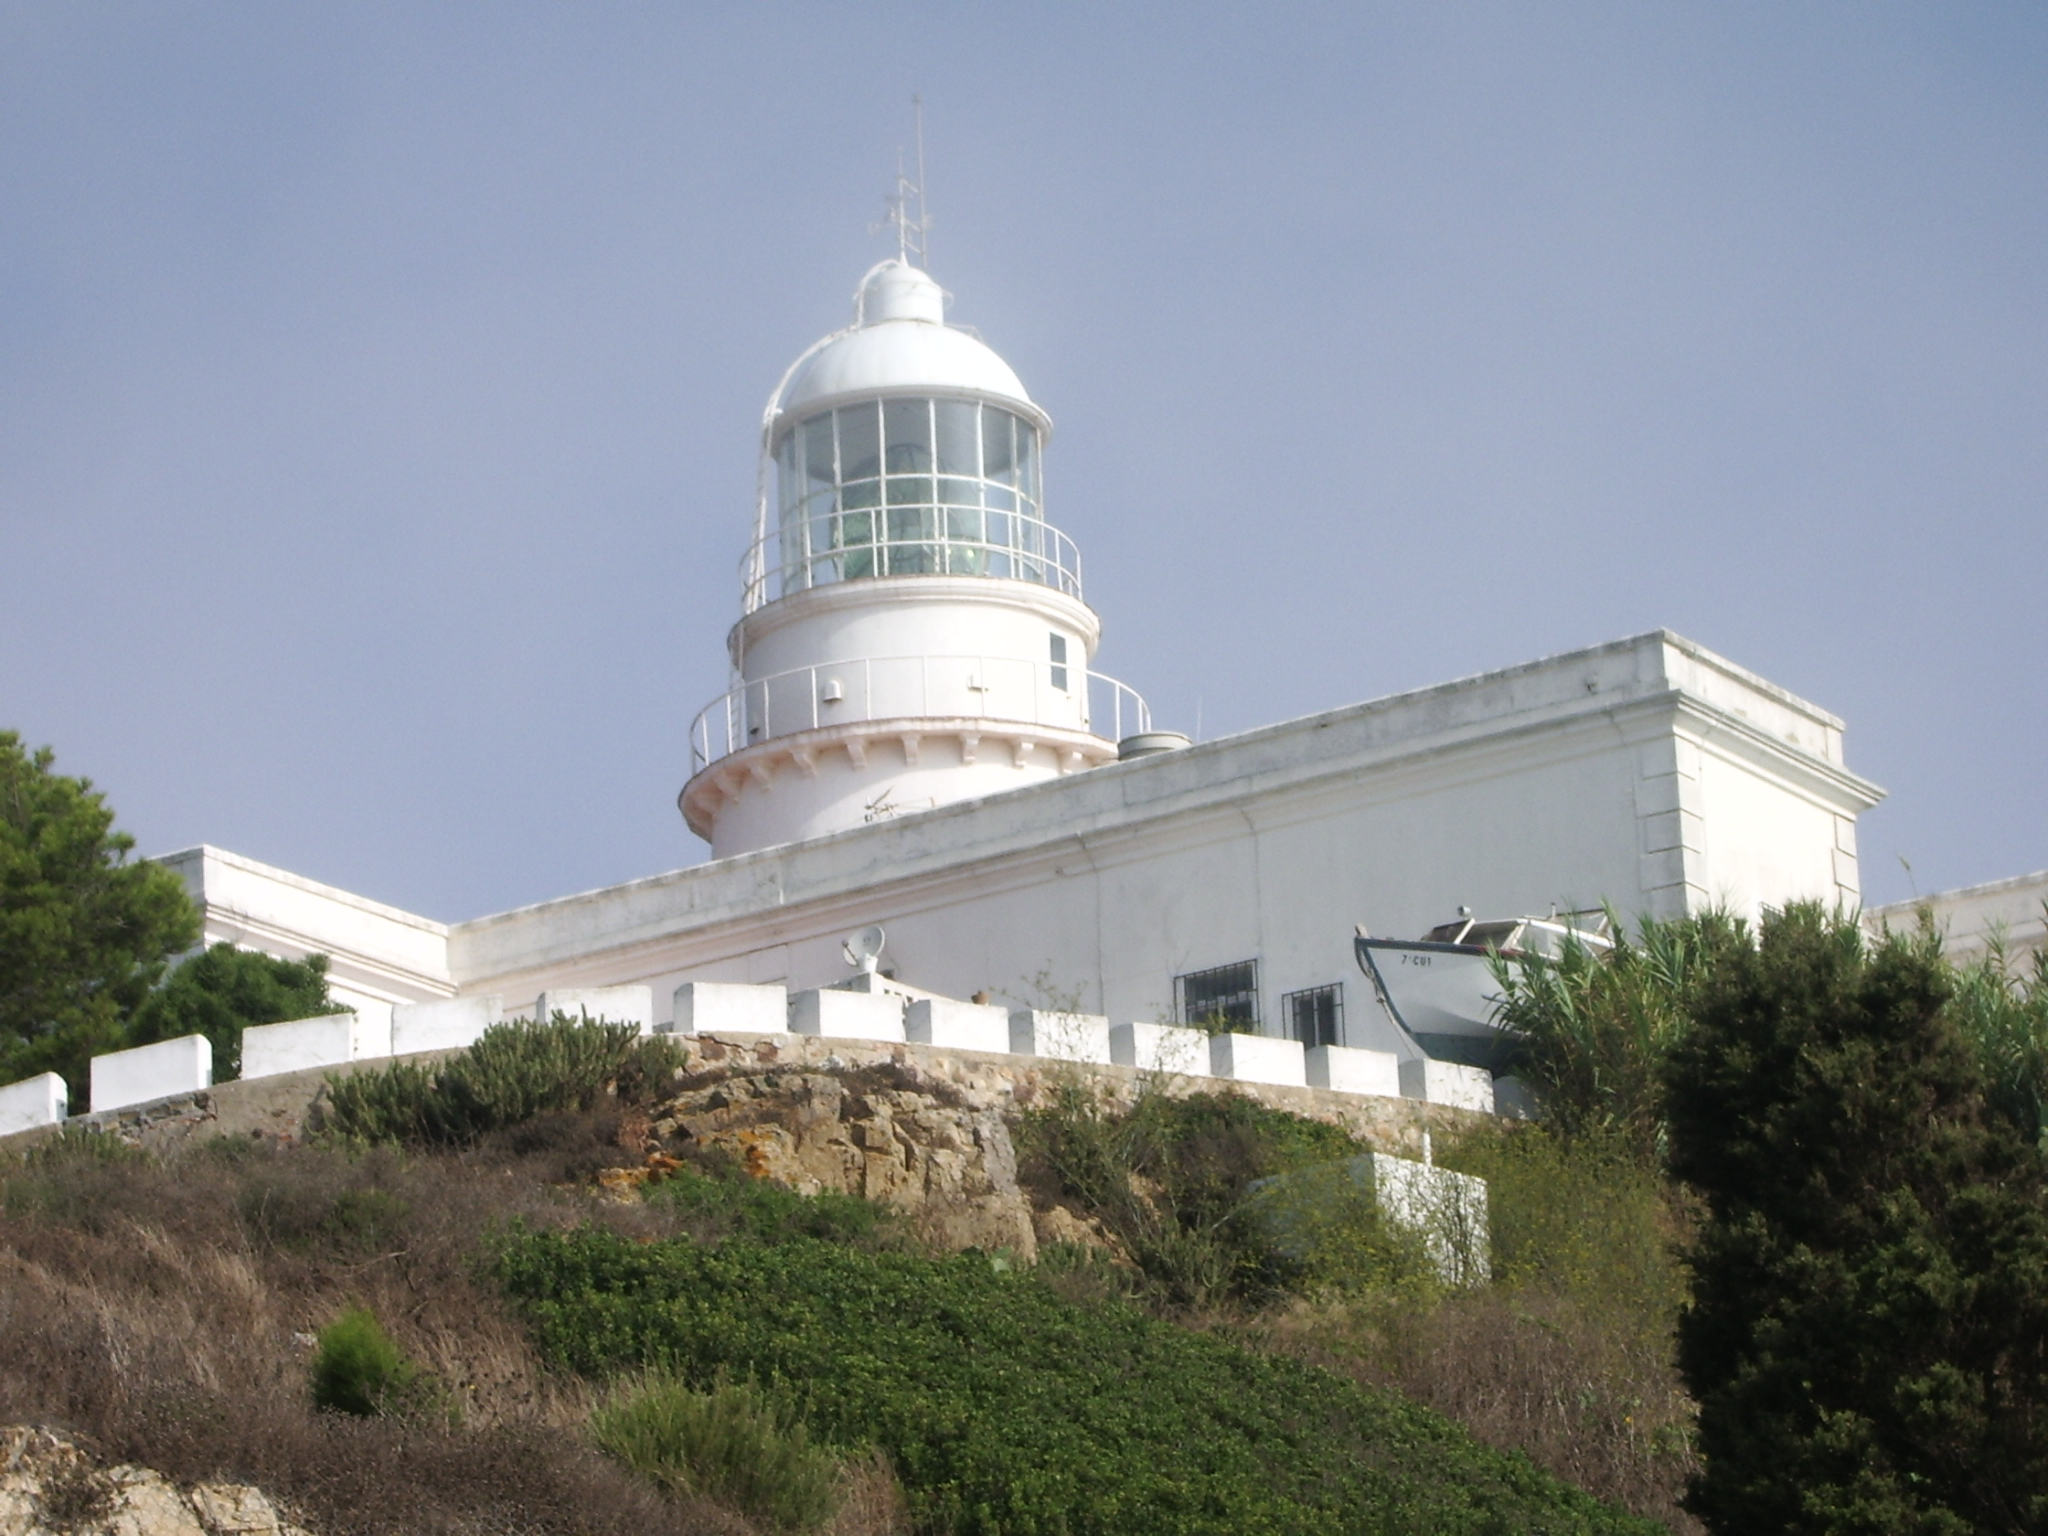 Punta Almina világítótorony (Forrás: www.wikipedia.hu)